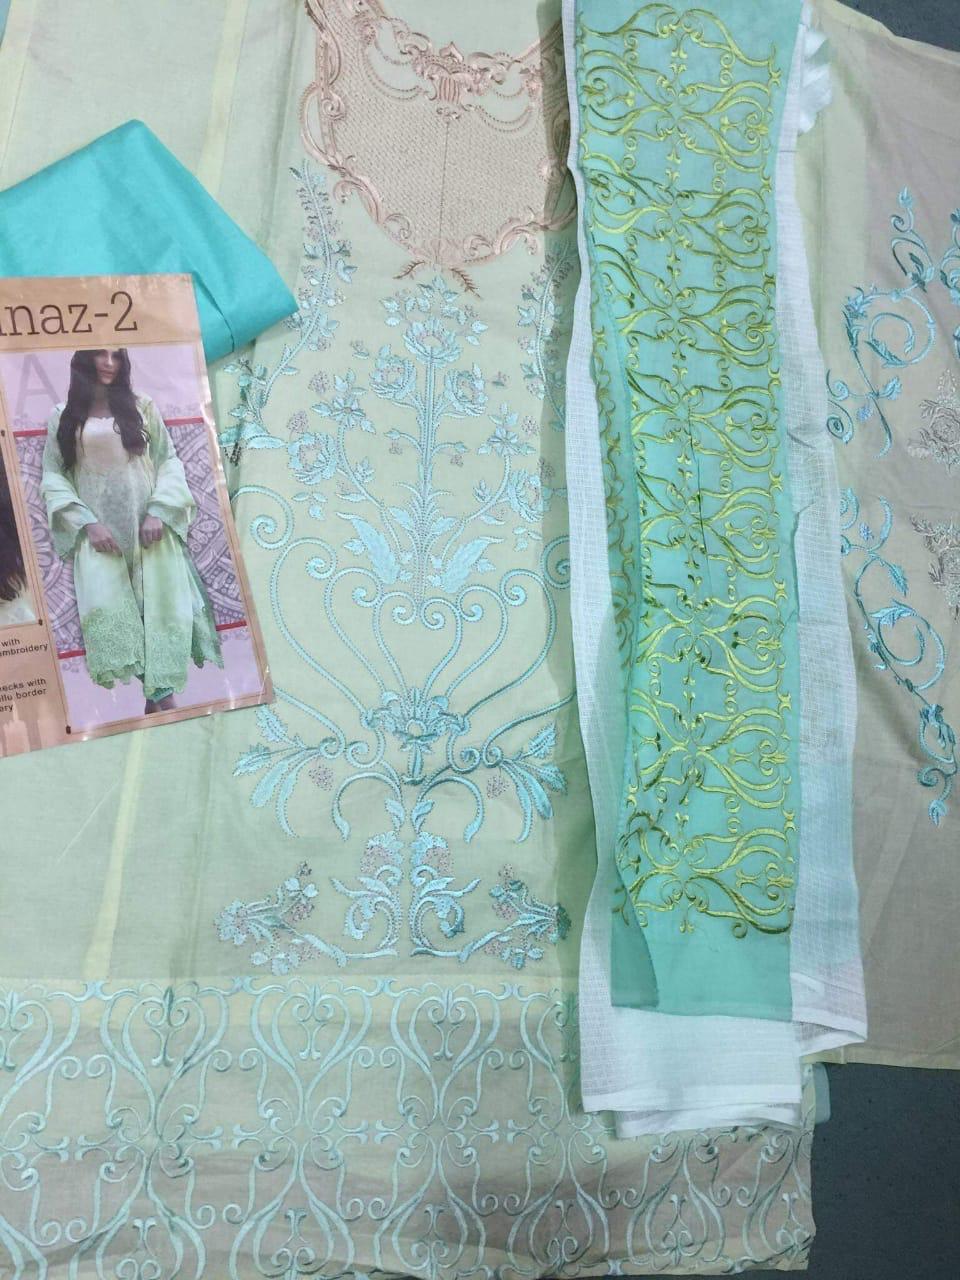 Deepsy Rinaaz 2 Designer Pure Cotton Suit In Single